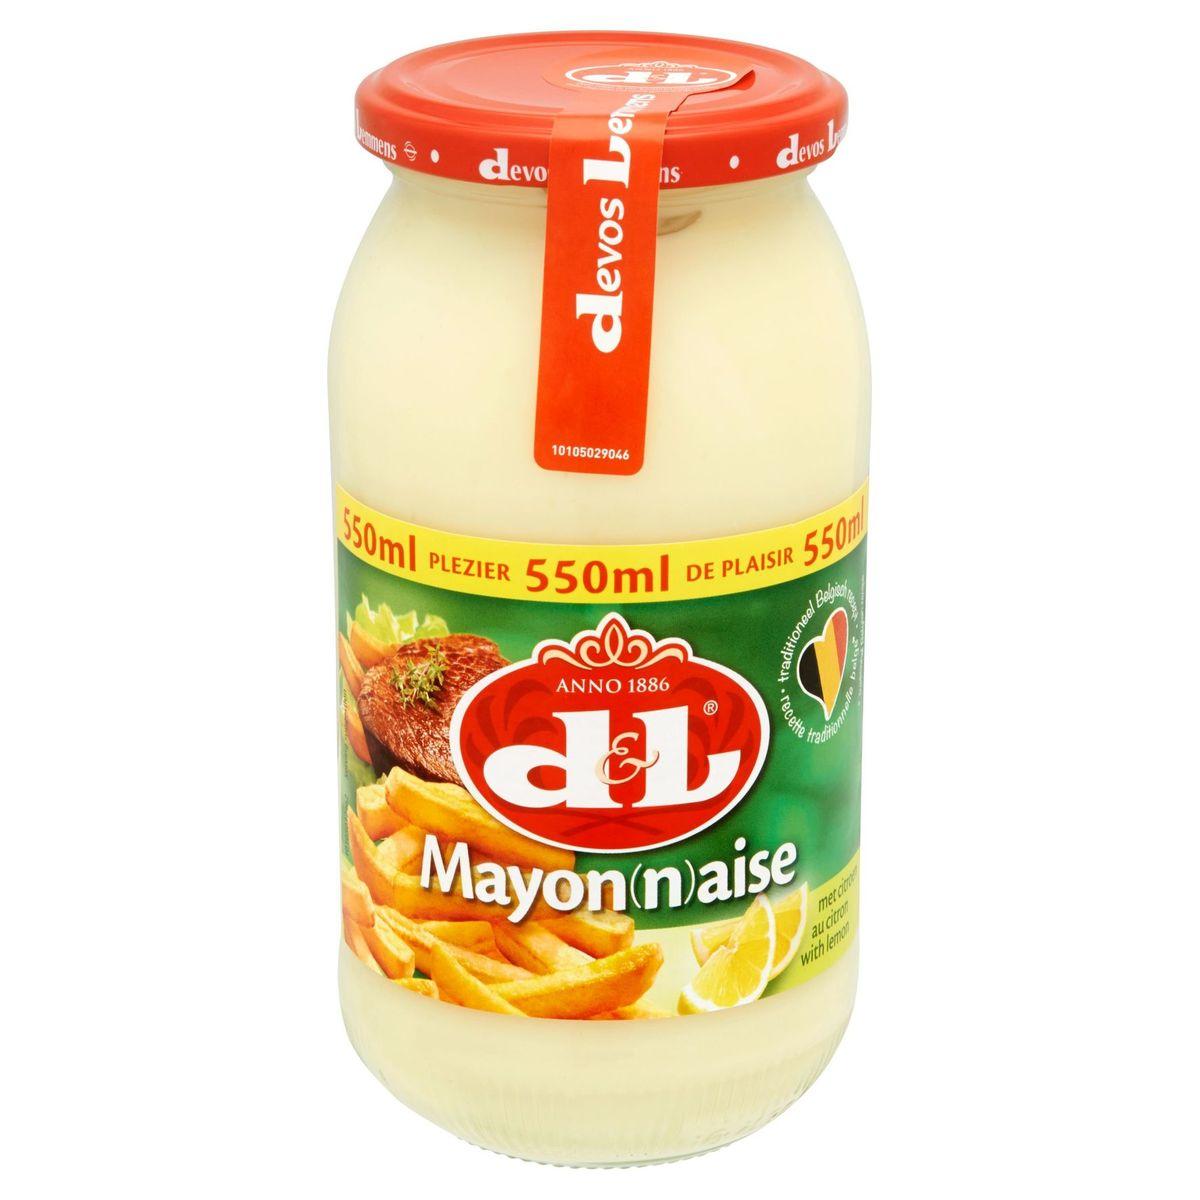 Devos Lemmens Mayonaise met Citroen 550 ml